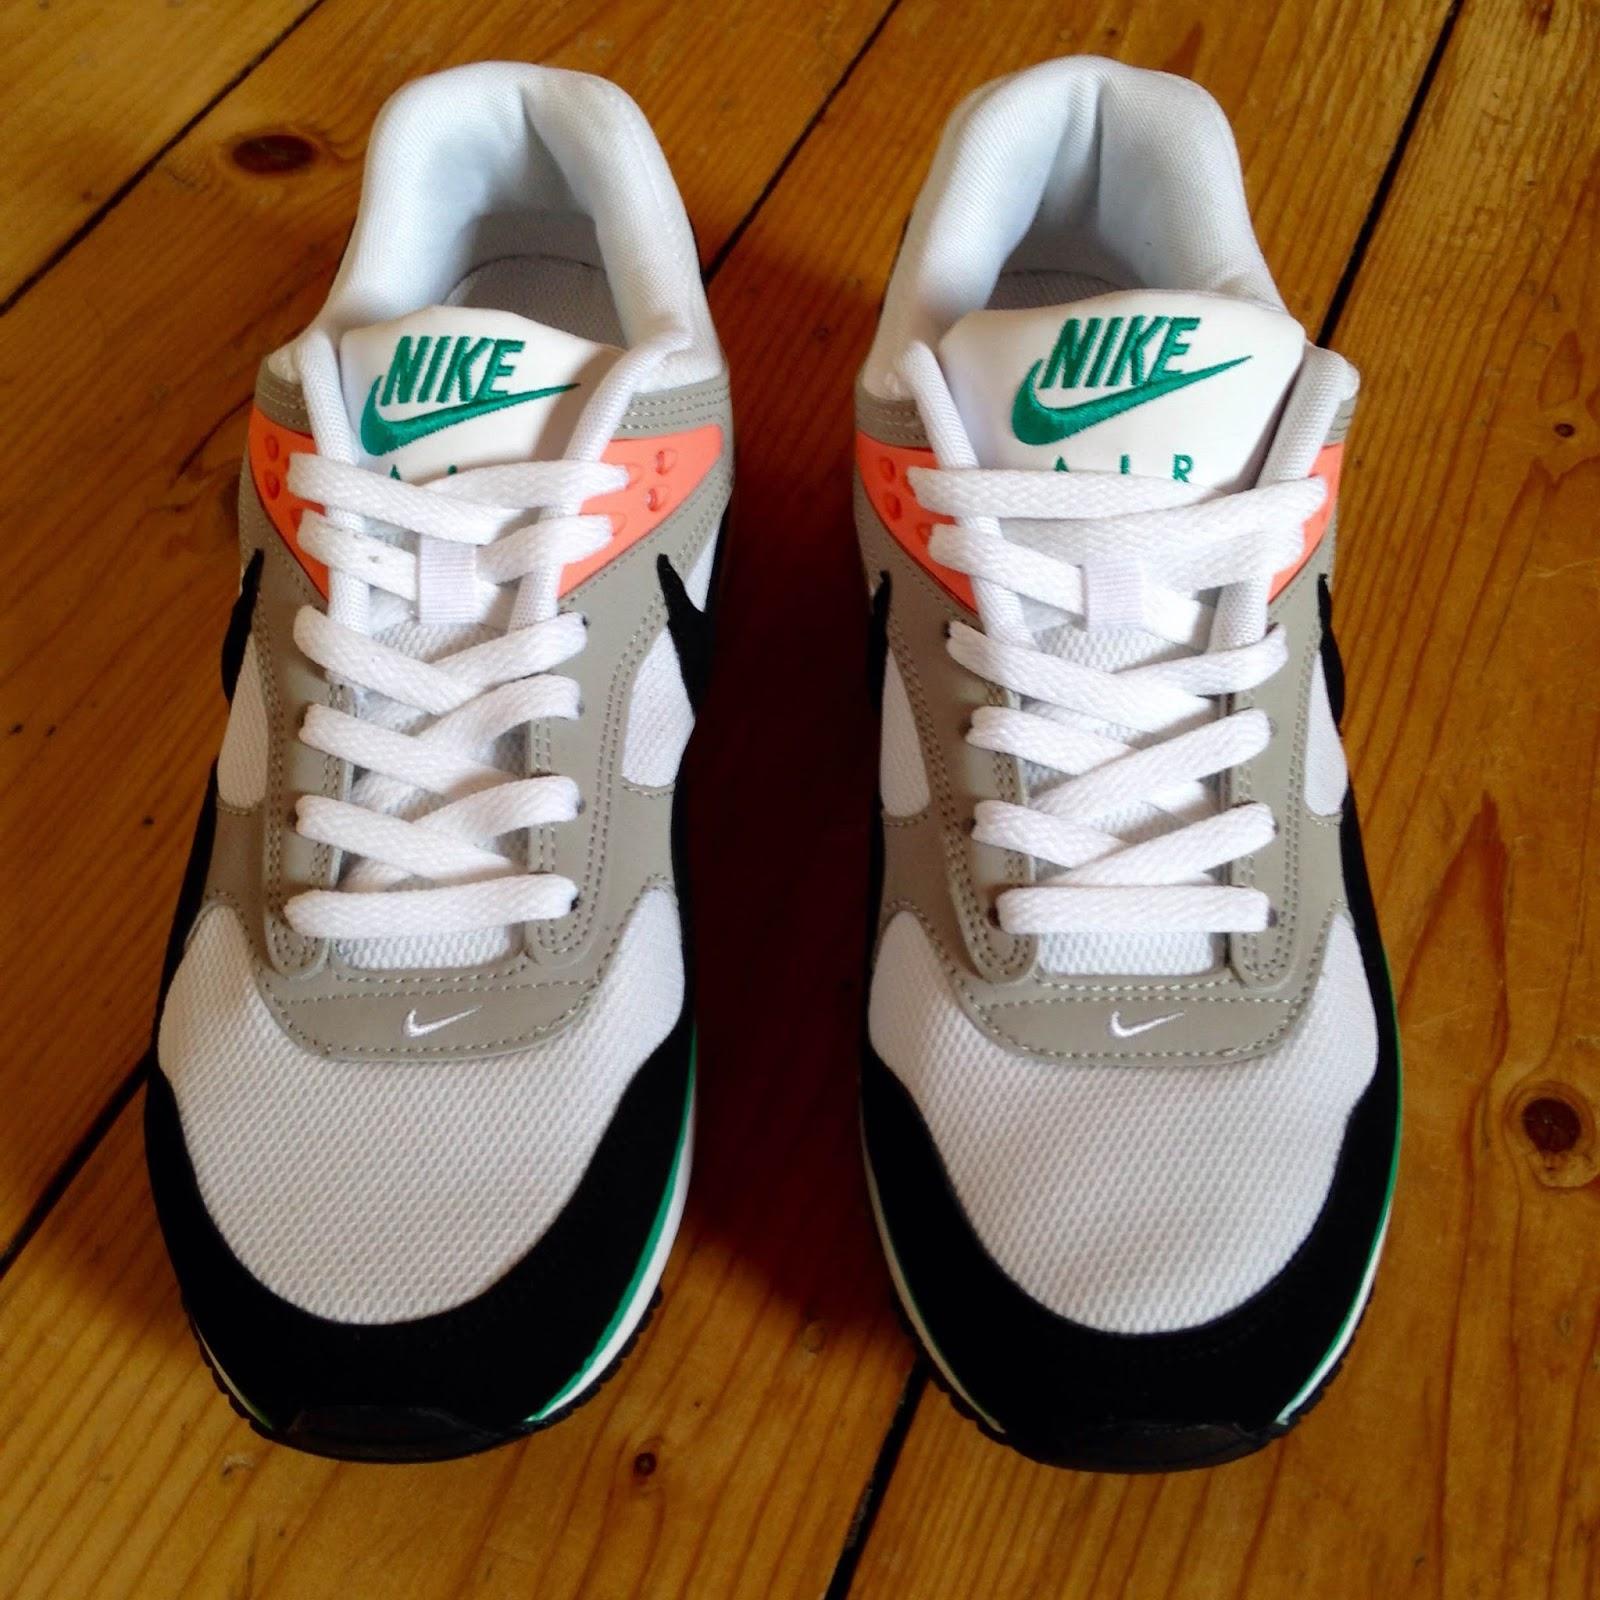 online store 5c12d b2713 Nike Womens Air Max Correlate; Nike Air Max Correlate Black White Green  Mango 511417-136 new US10 90.00 ...